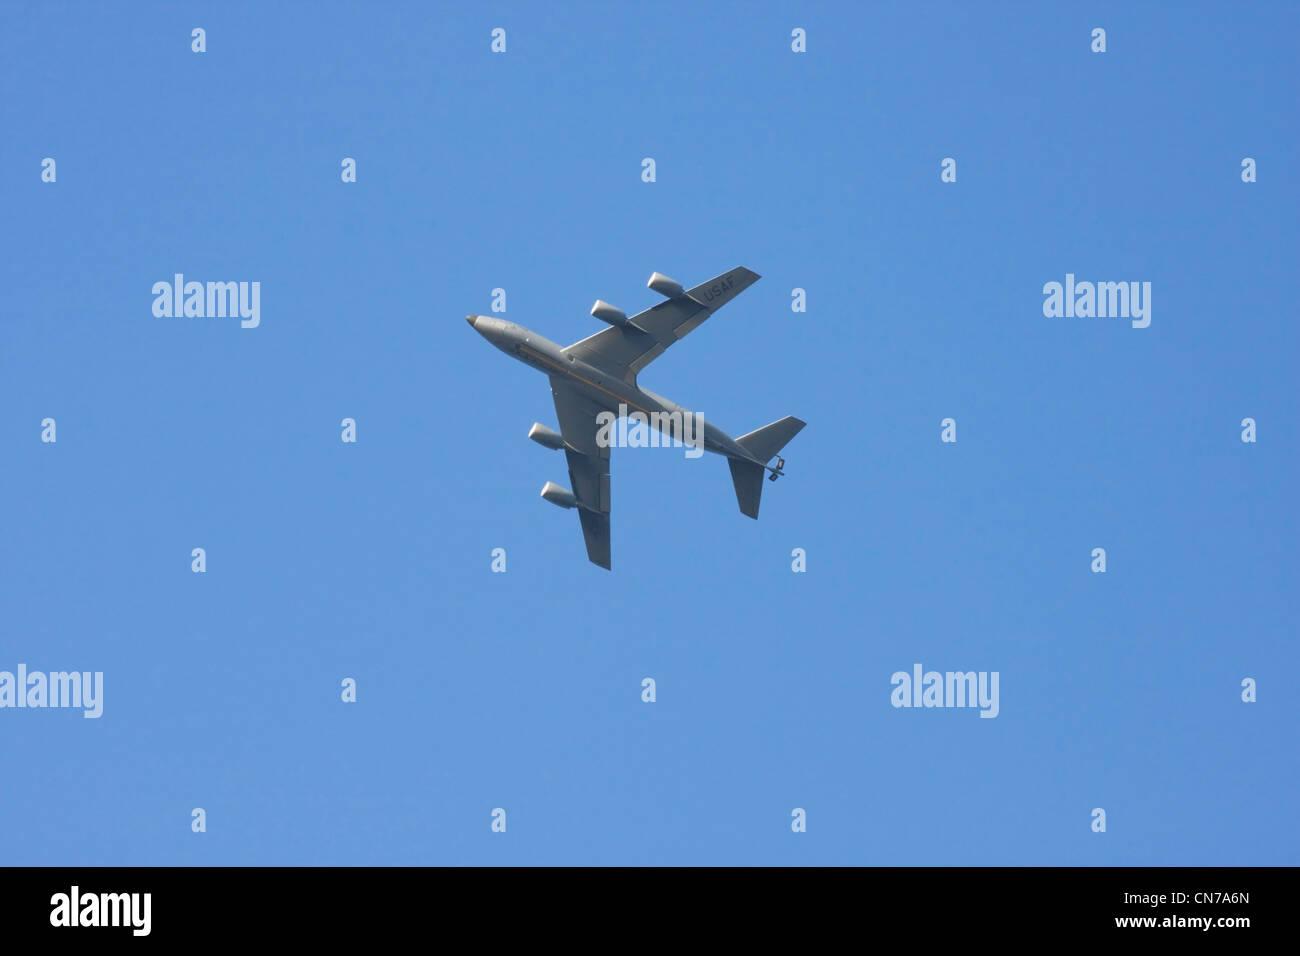 American Navy tanker airplane flying in blue sky. - Stock Image